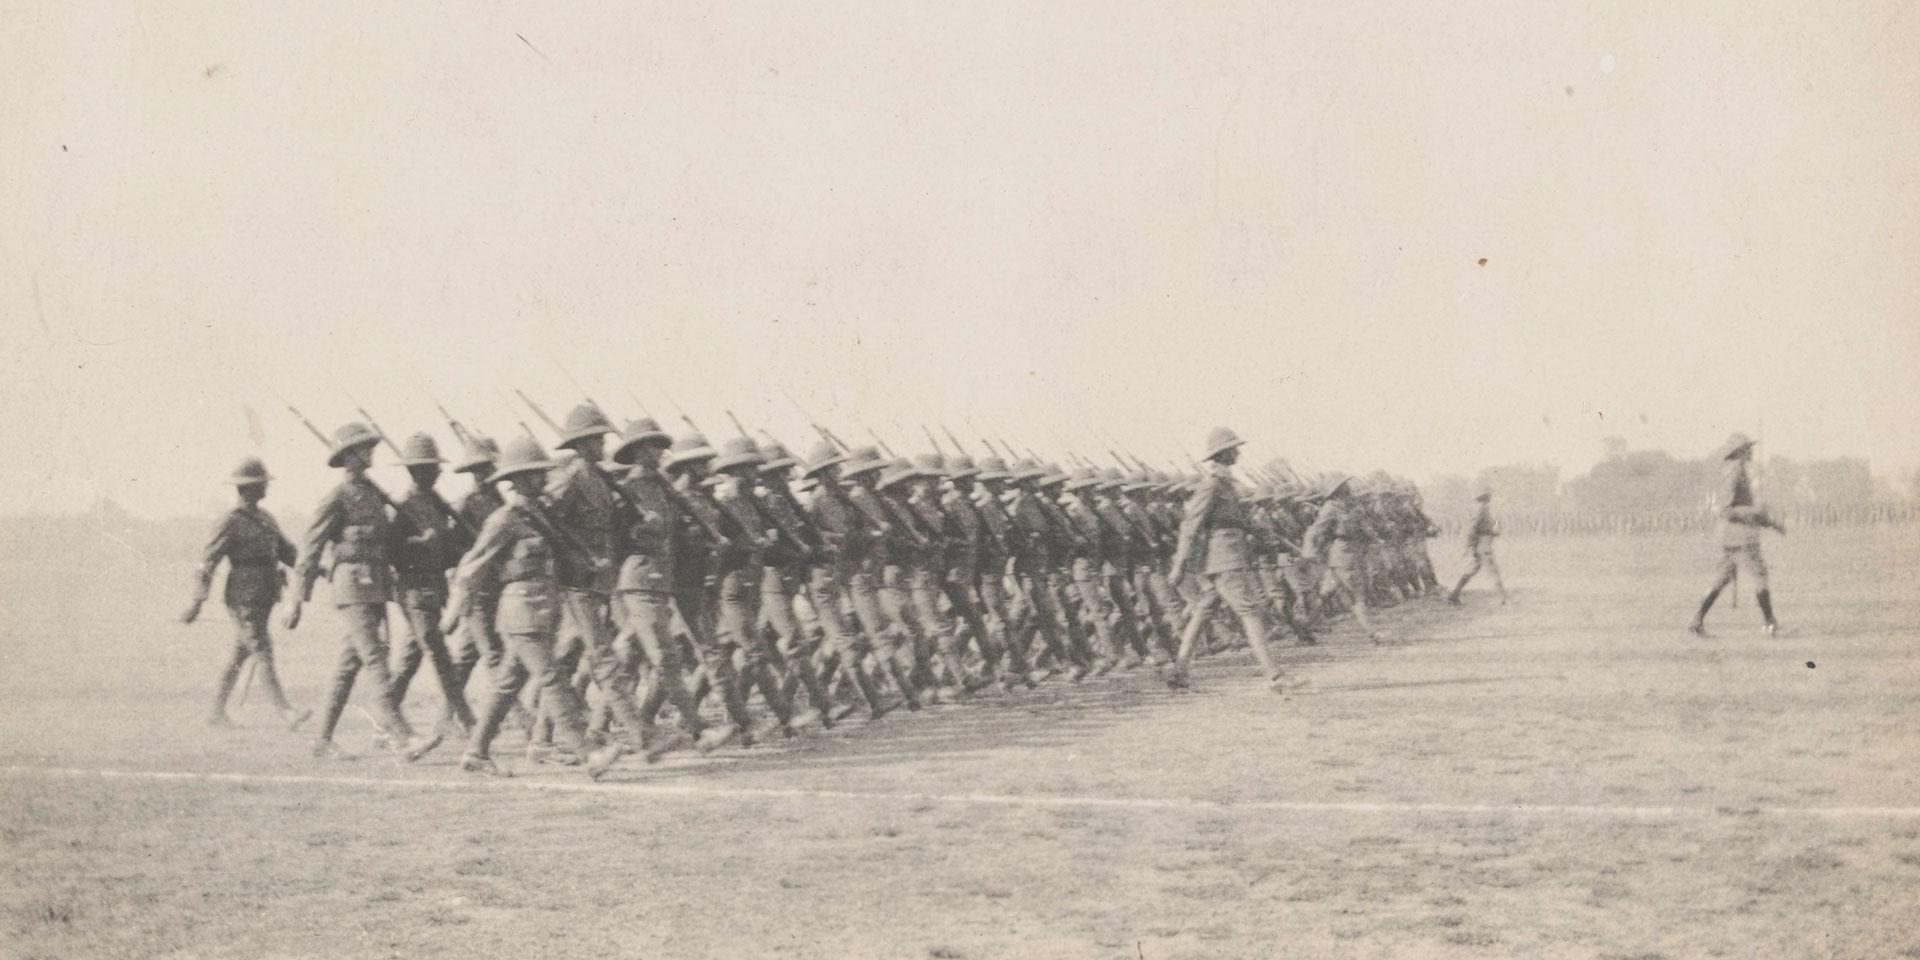 Members of 2/4th Battalion The Duke of Edinburgh's (Wiltshire Regiment) at the Armistice Parade in India, 1918